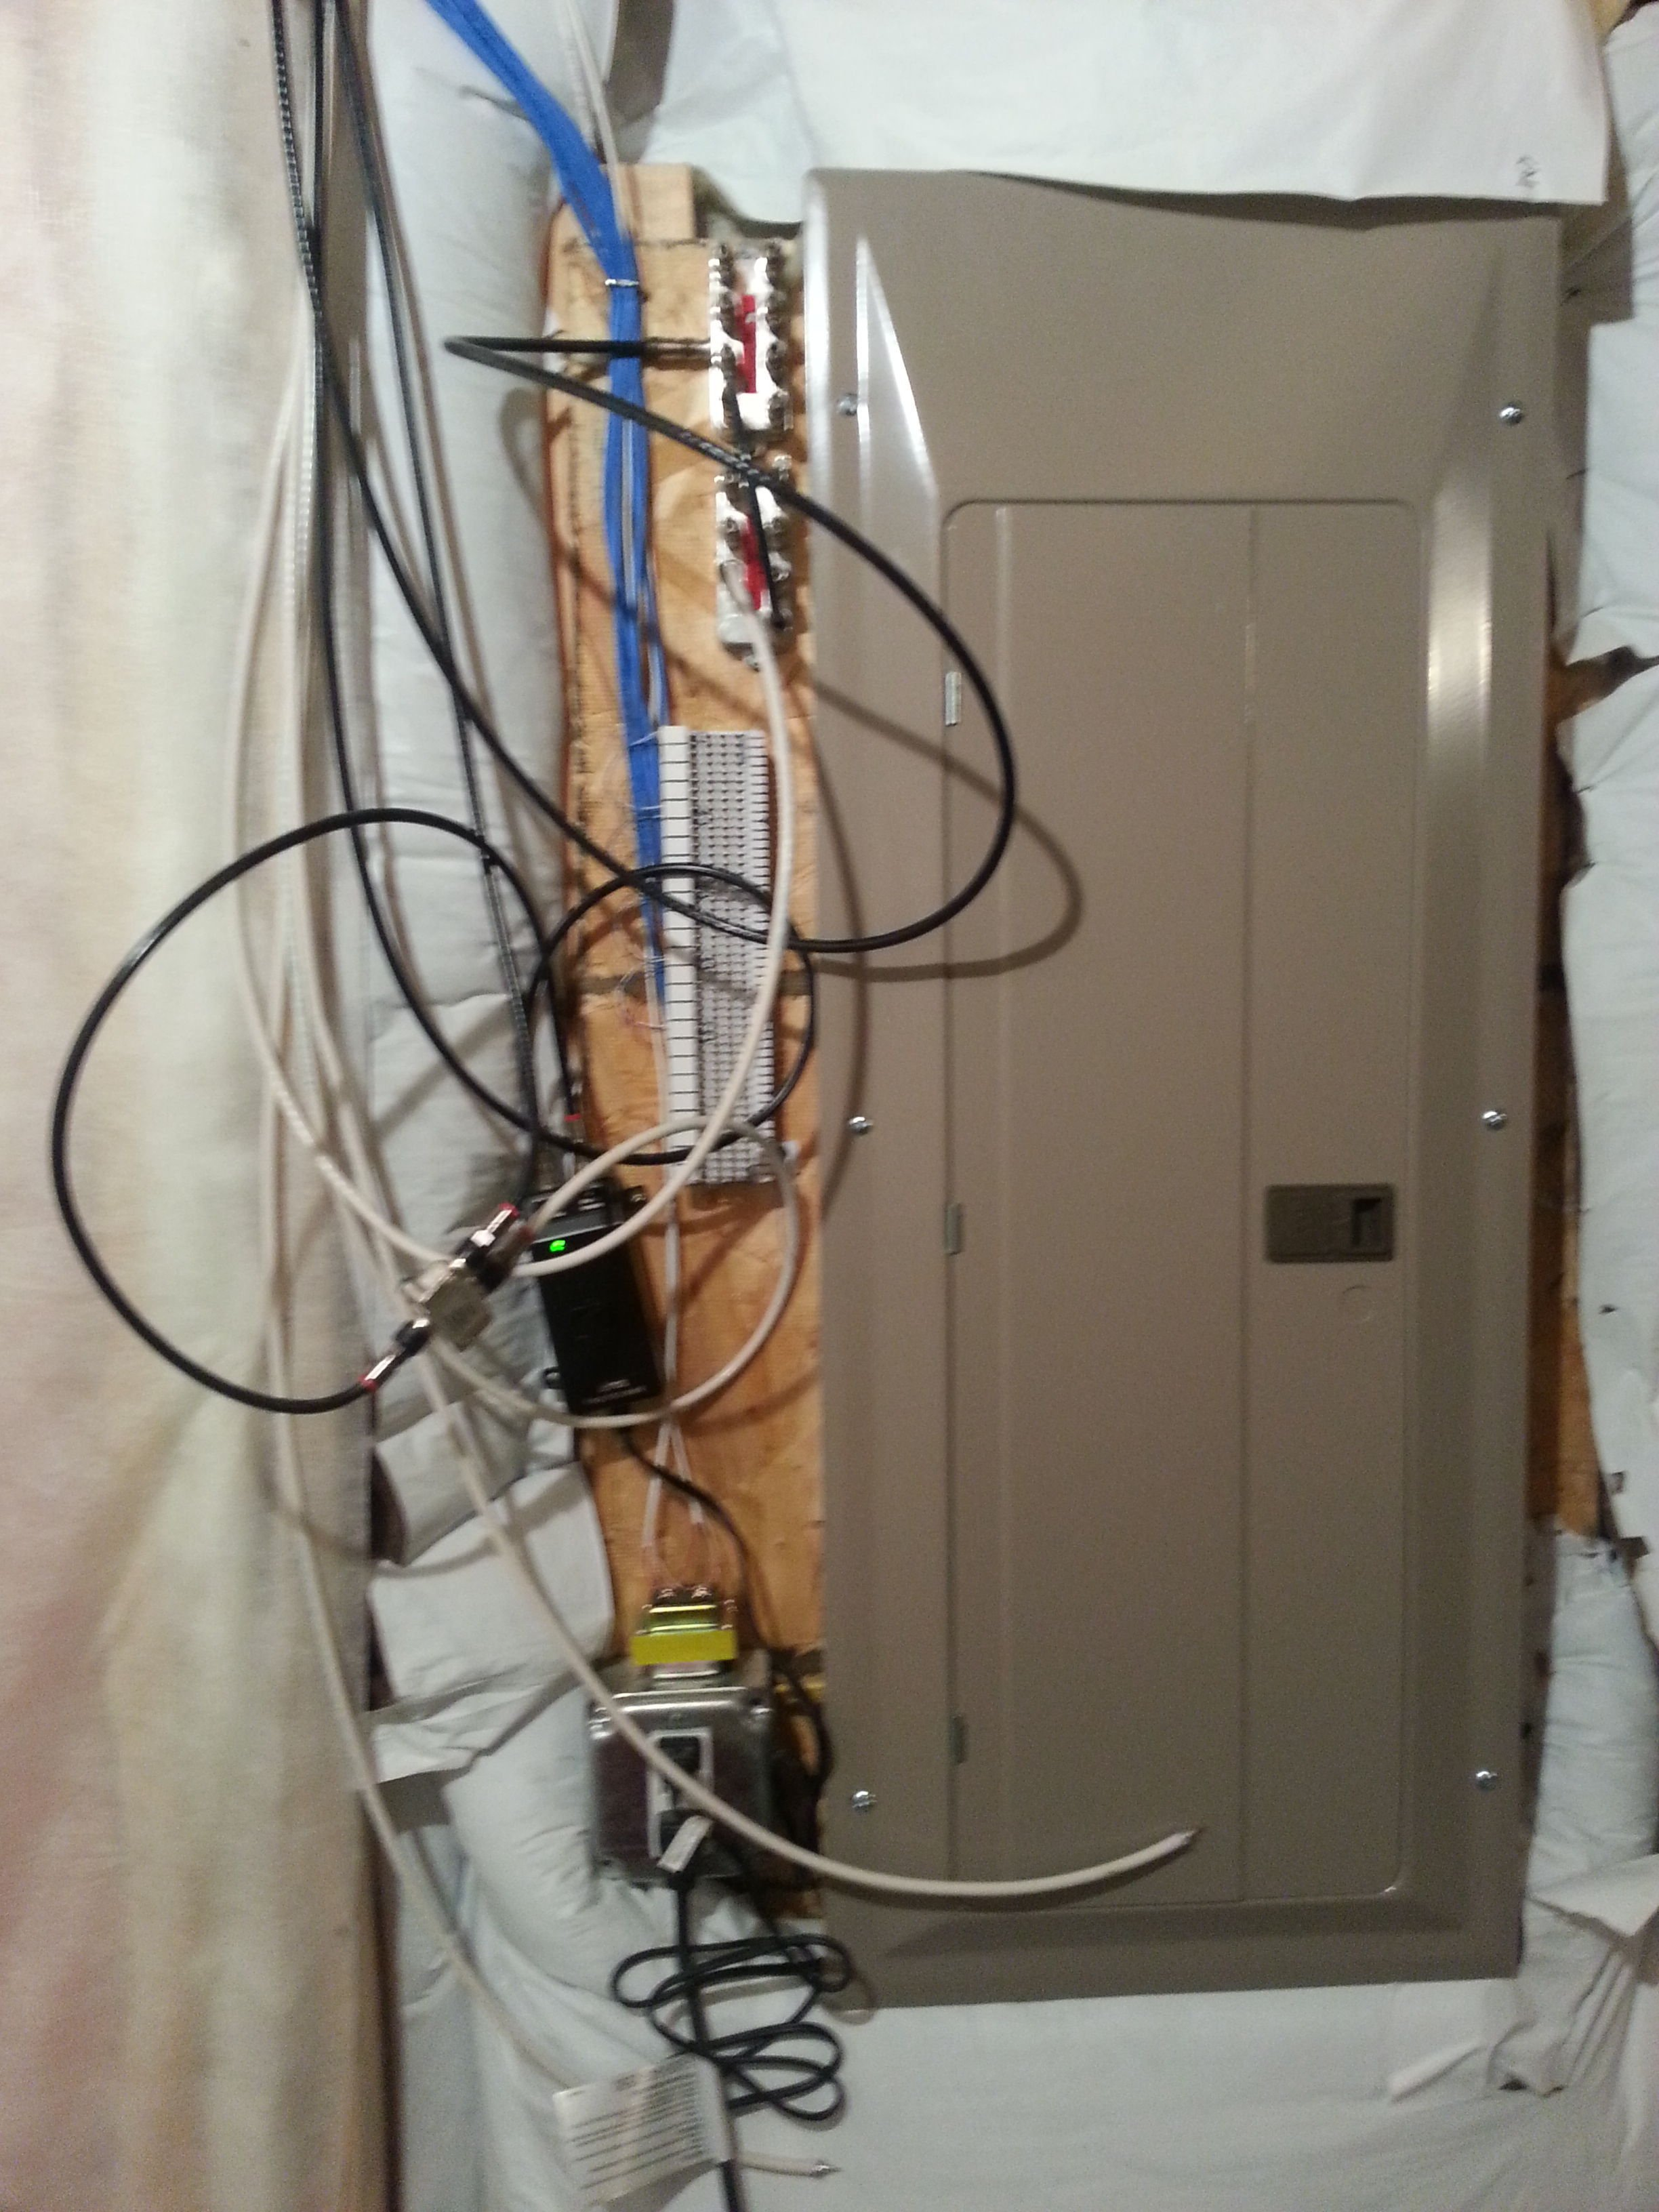 installing new cat5e cat6 in basement avs forum home theater rh avsforum com Basement Wiring for Lighting Wiring a Dryer in the Basement